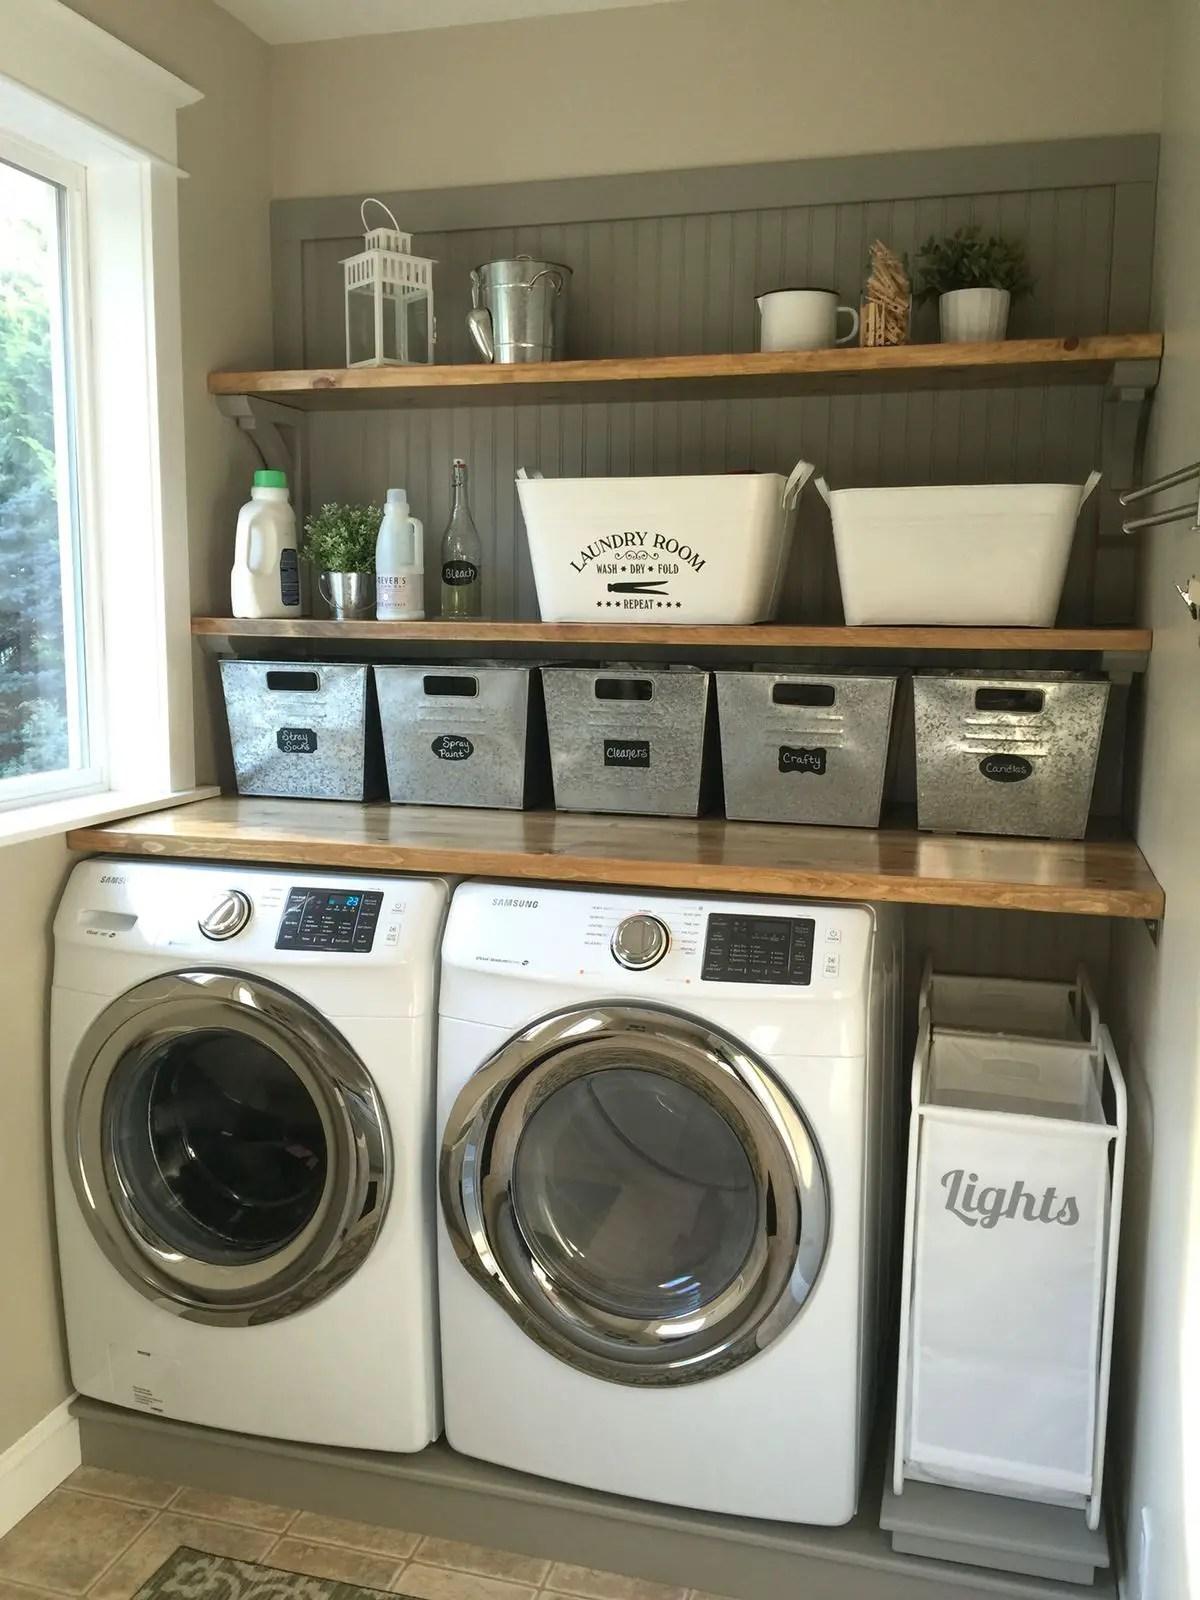 Genial Small Laundry Room Ideas 14